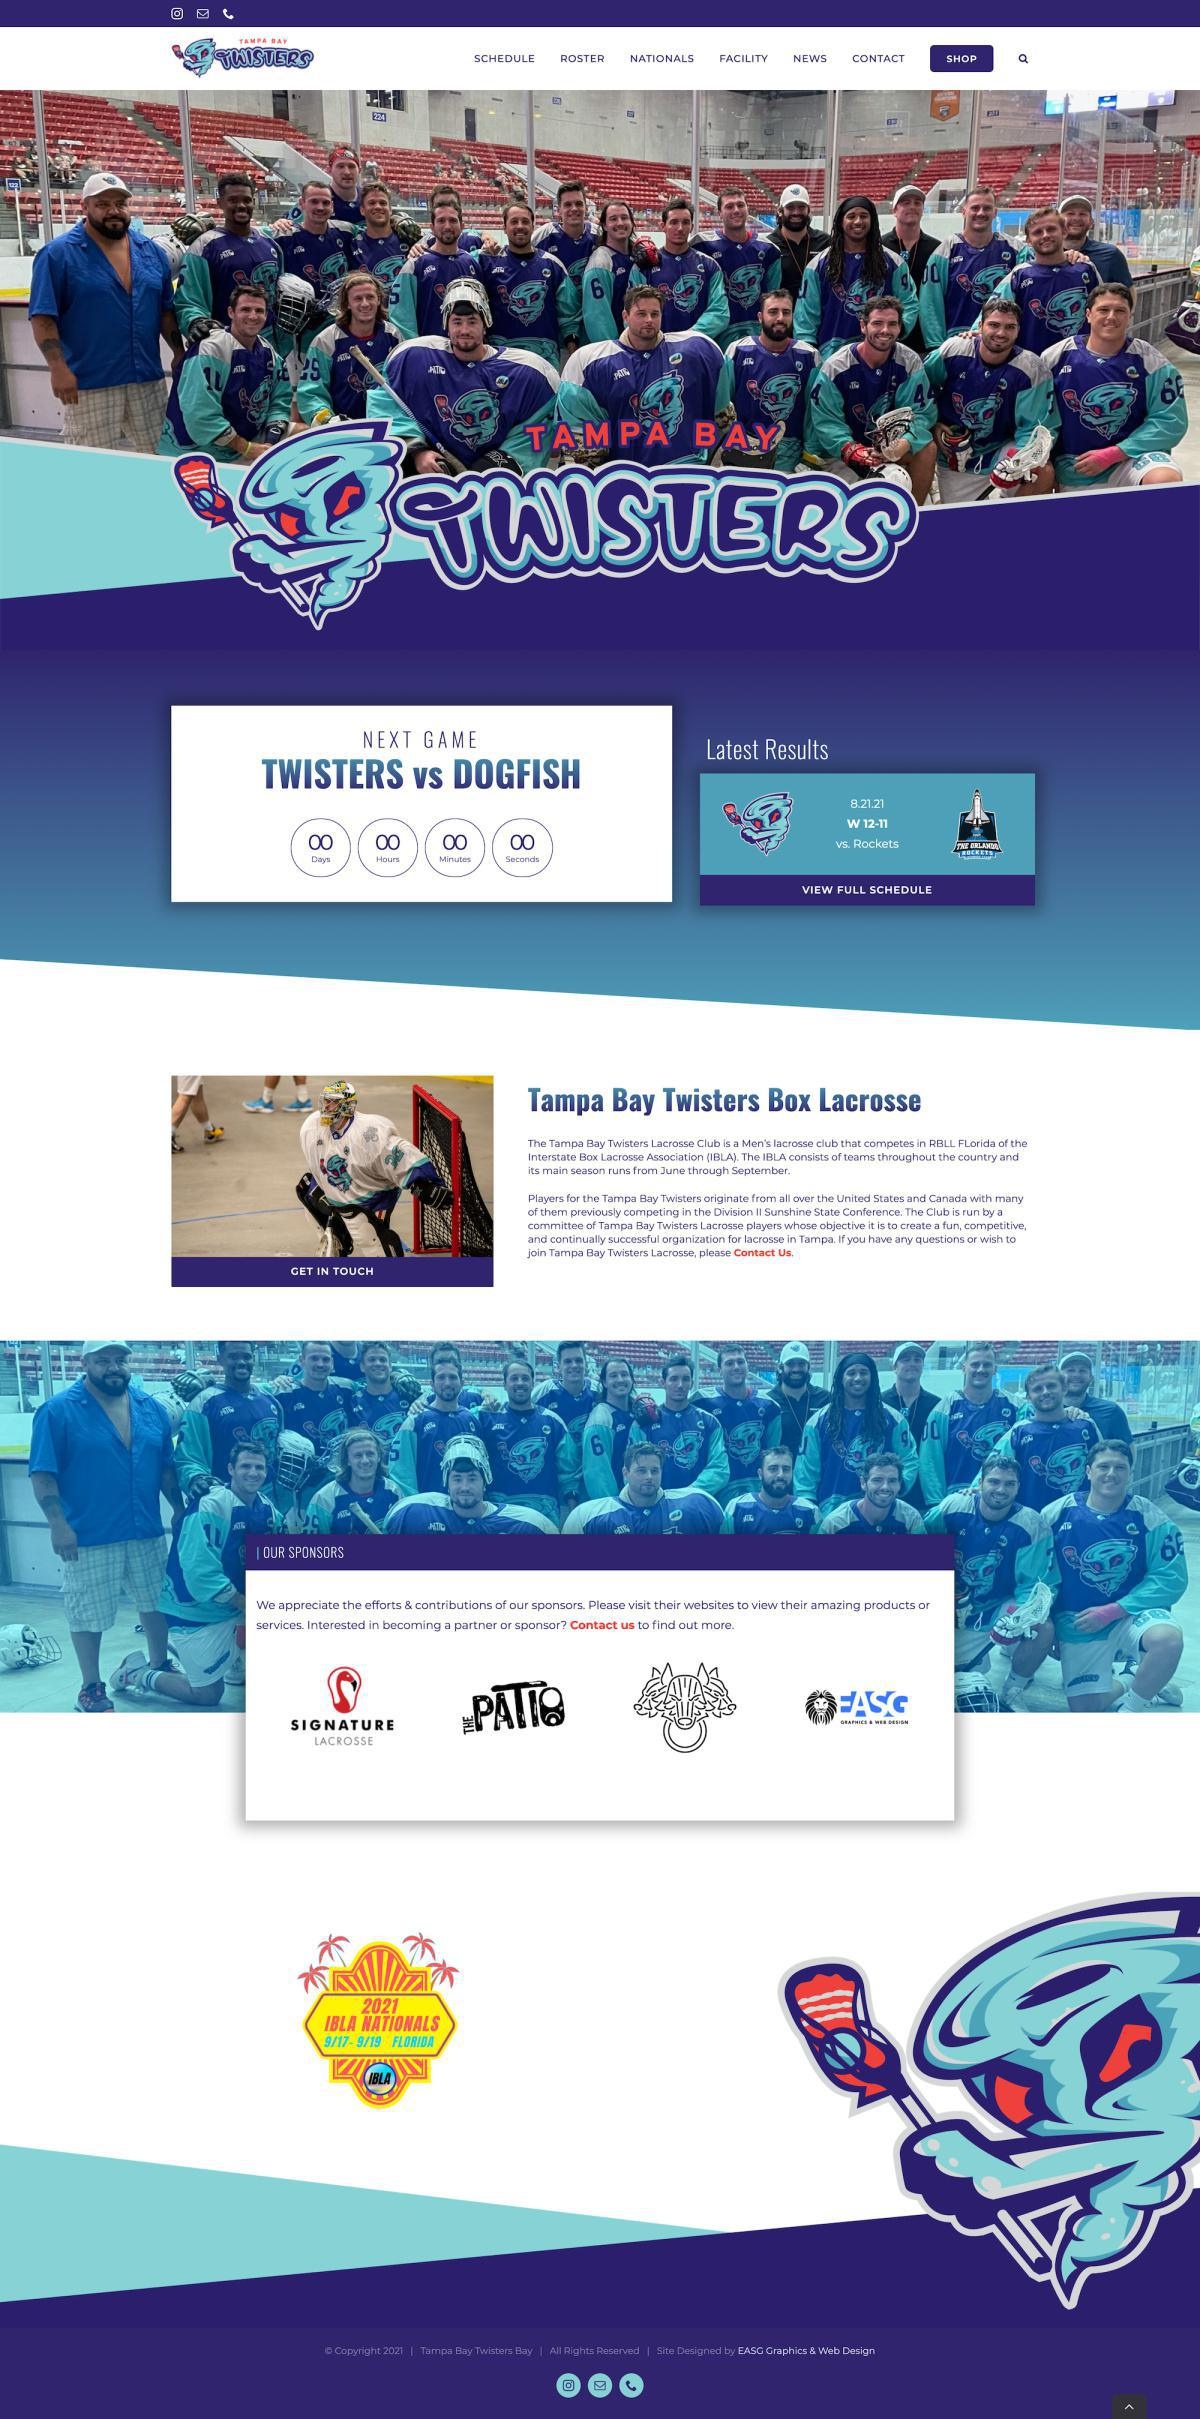 TAMPA BAY TWISTERS BOX LACROSSE